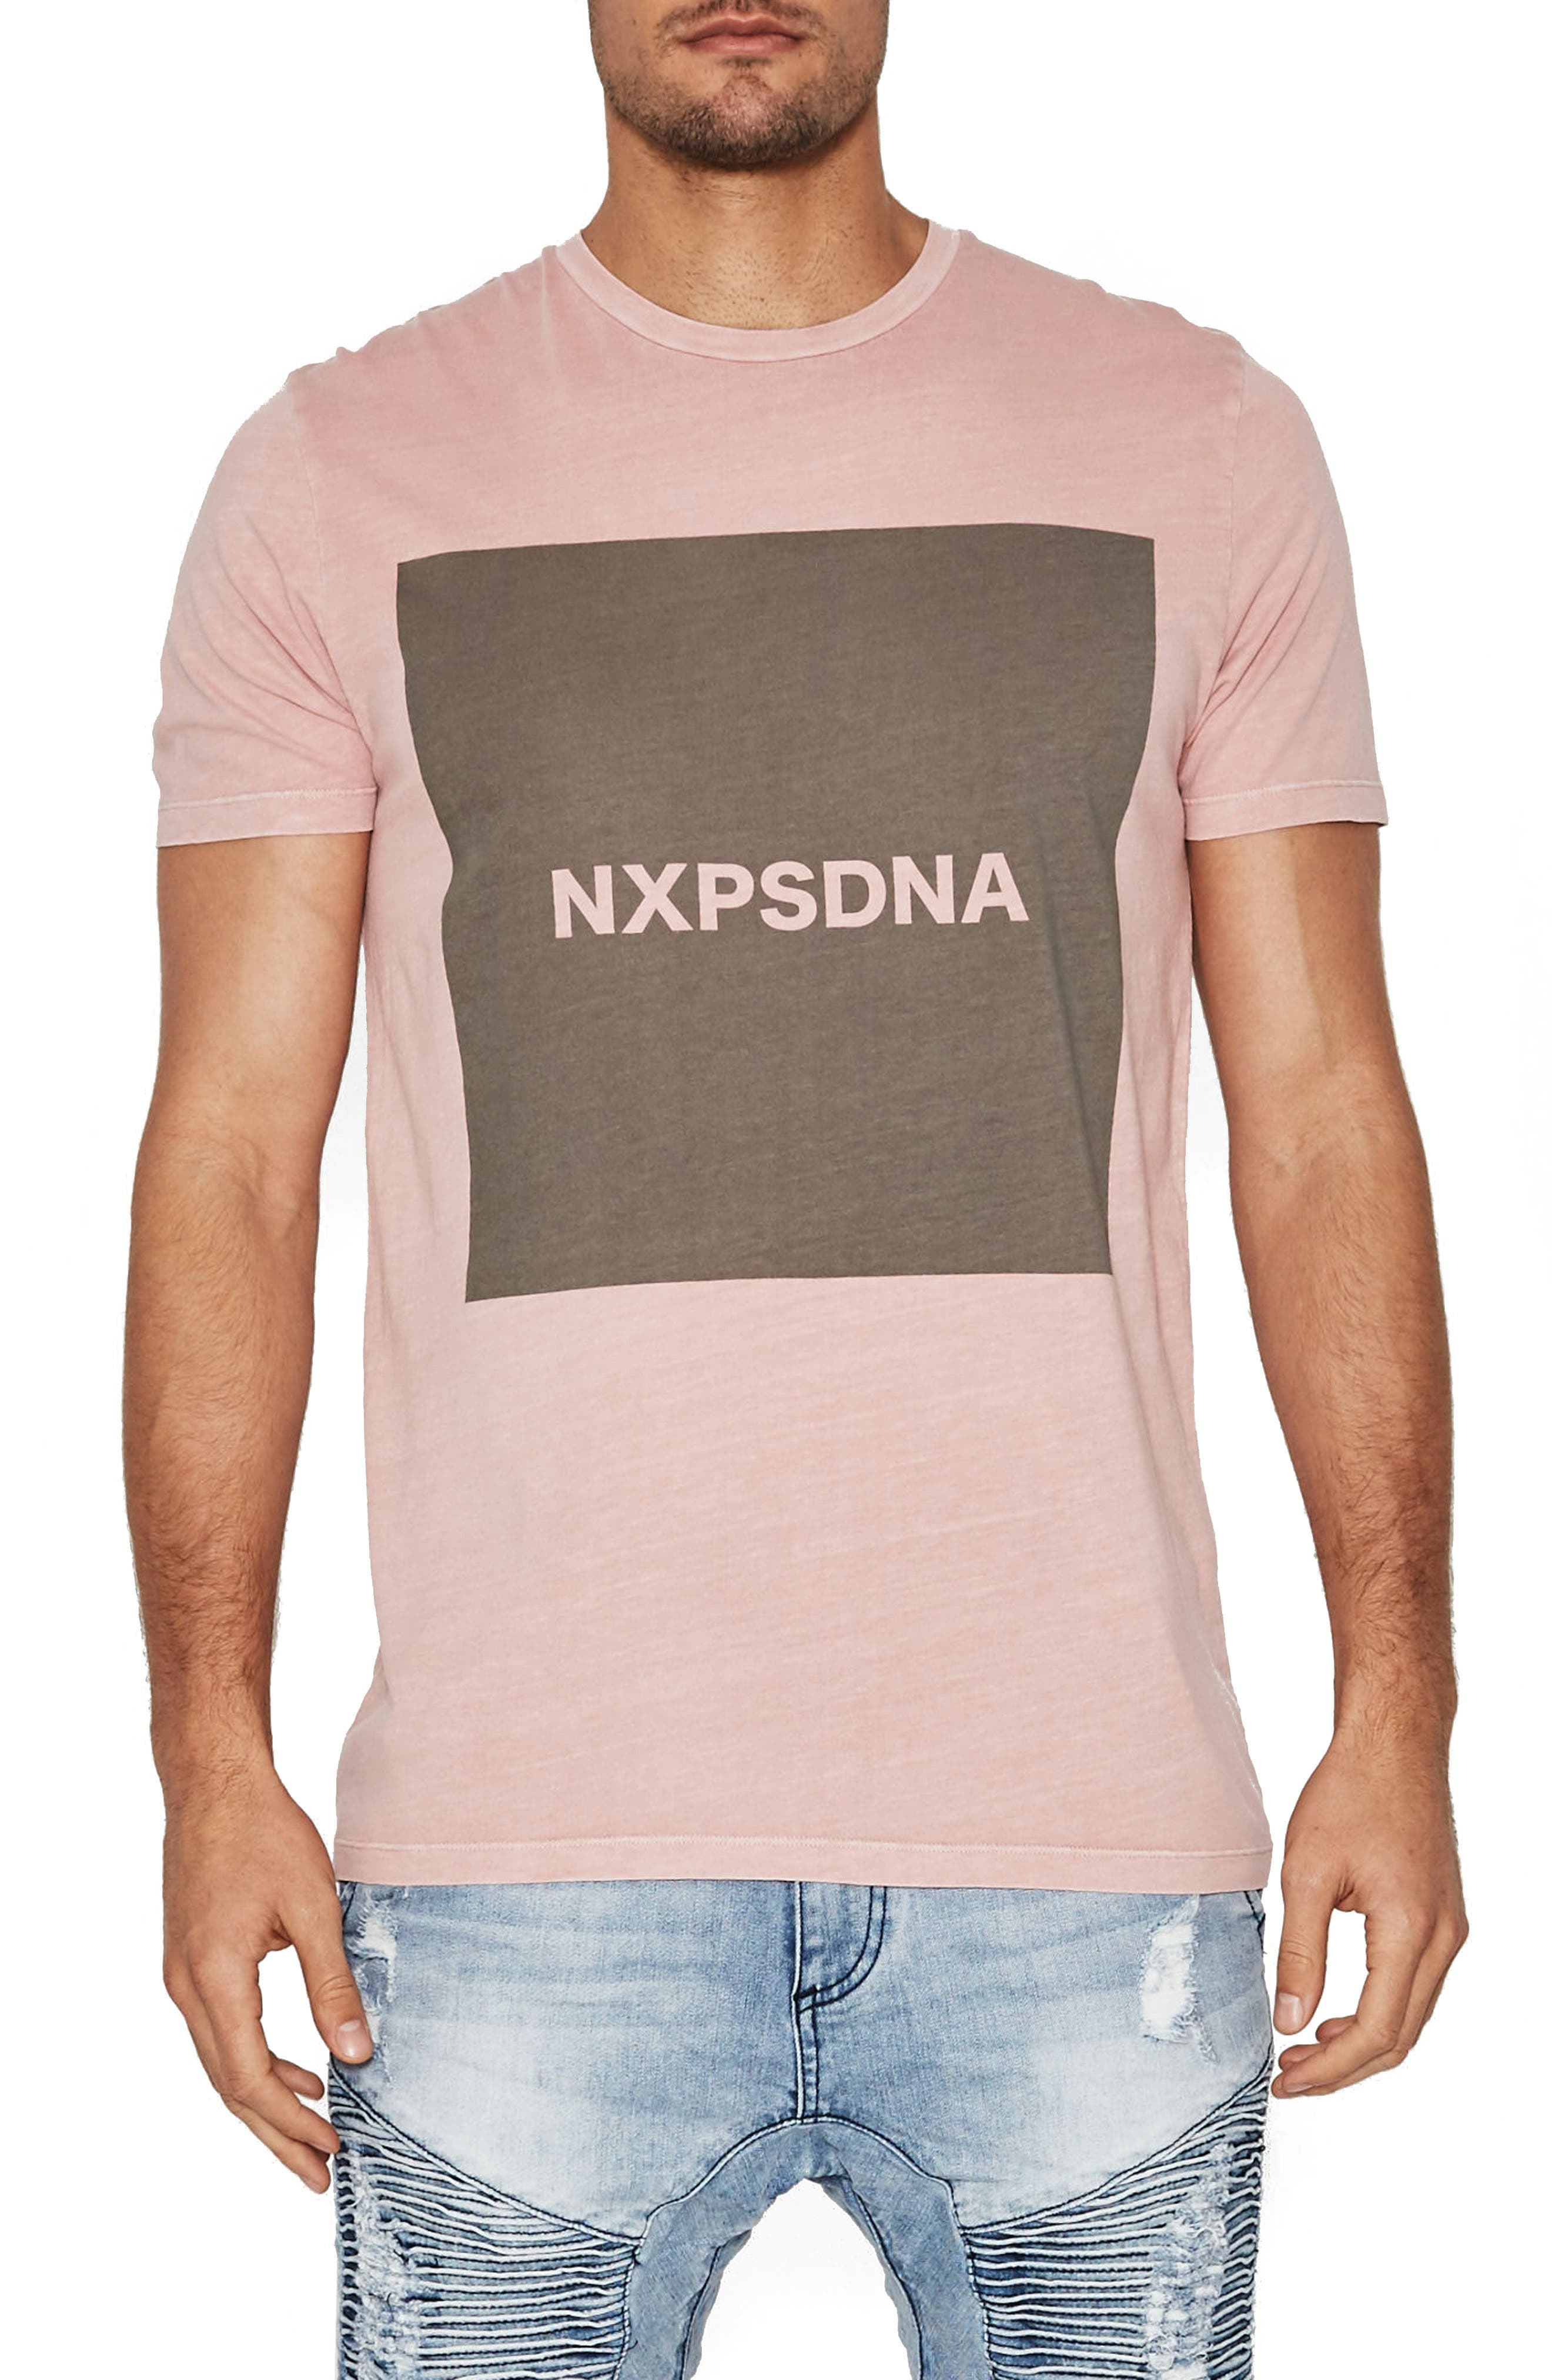 Islands Graphic T-Shirt,                             Main thumbnail 1, color,                             950